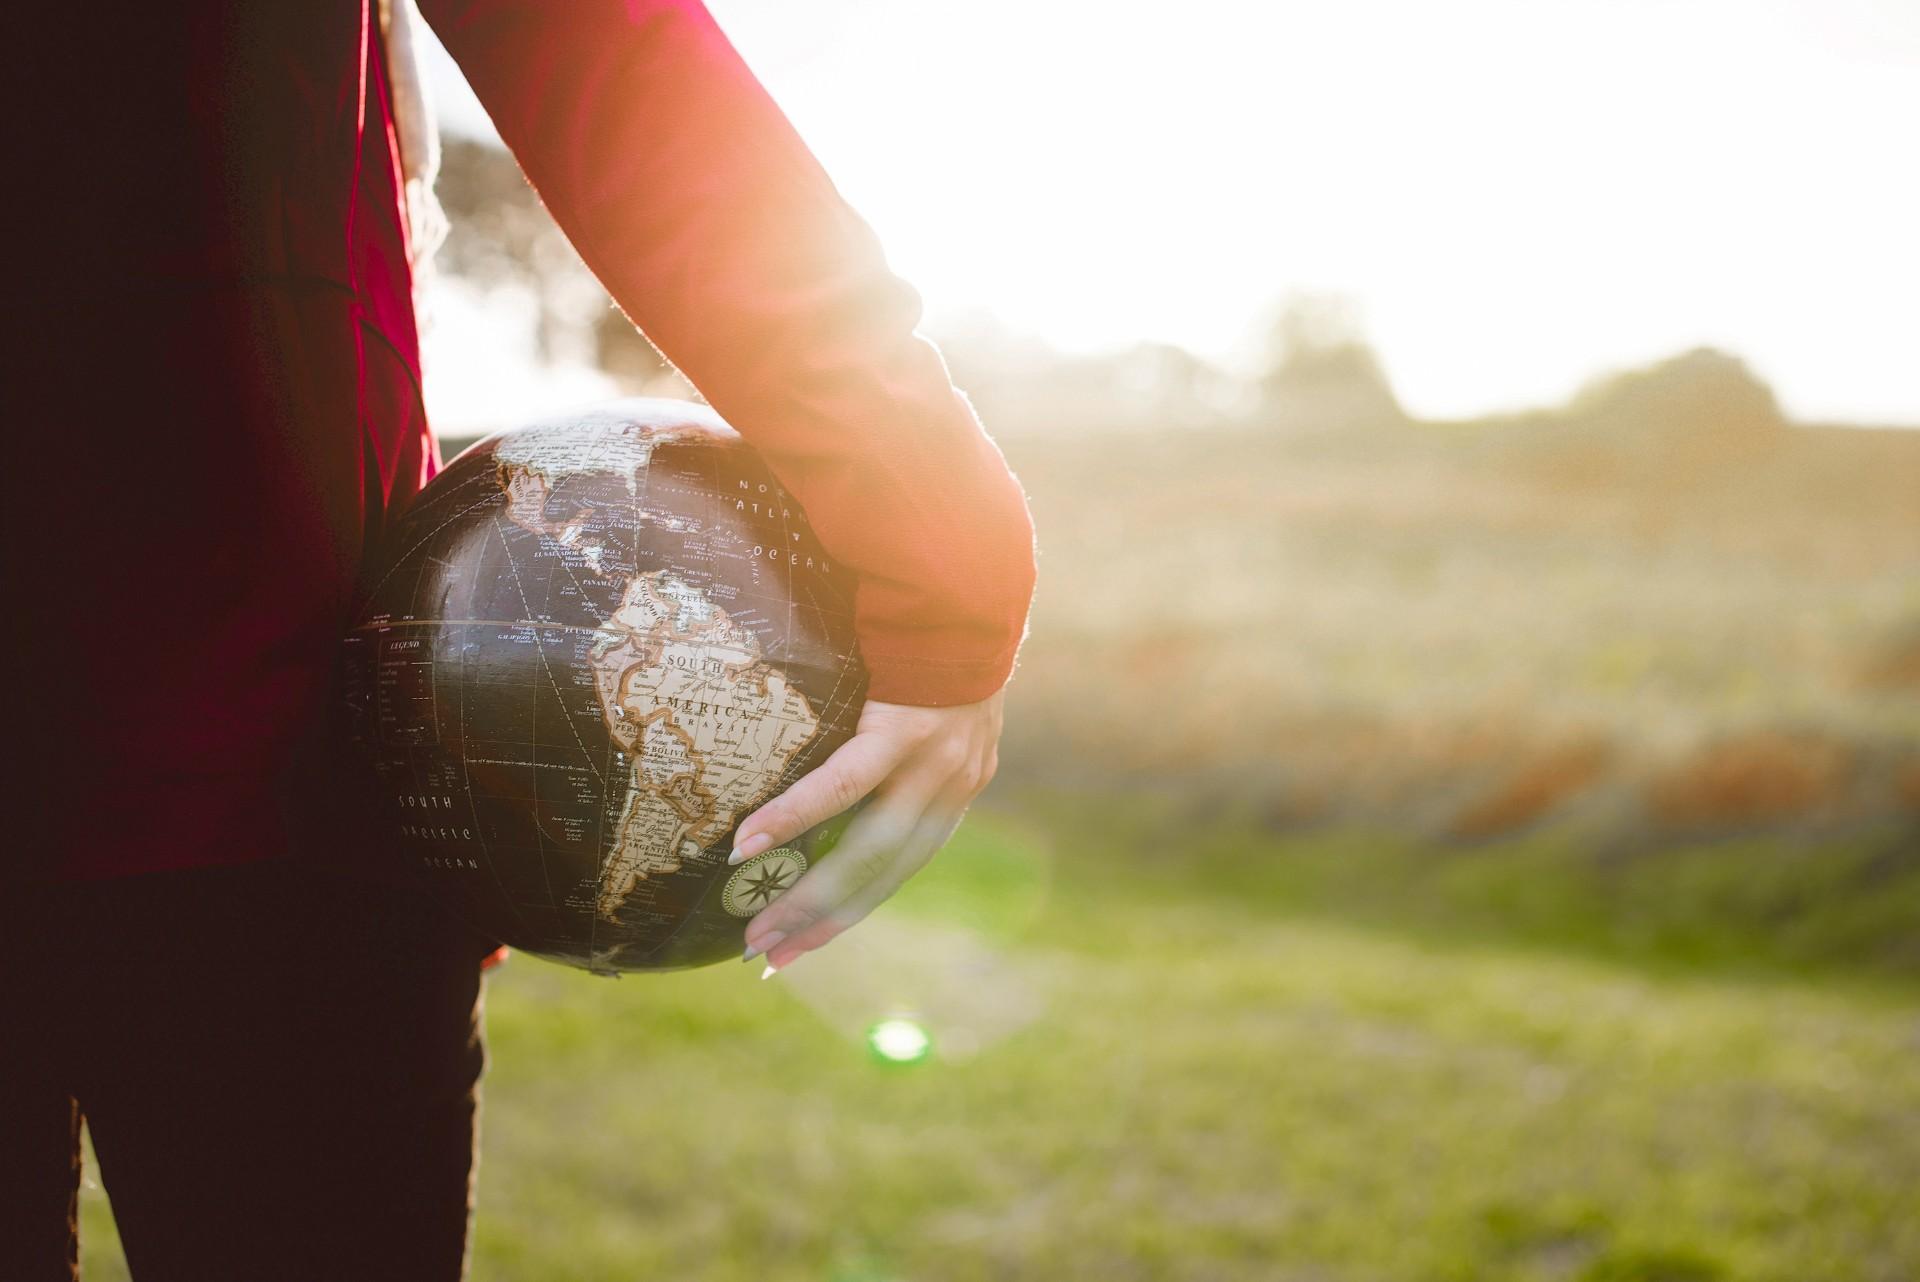 Women holding globe in hands girl earth outdoors green grass travel goals